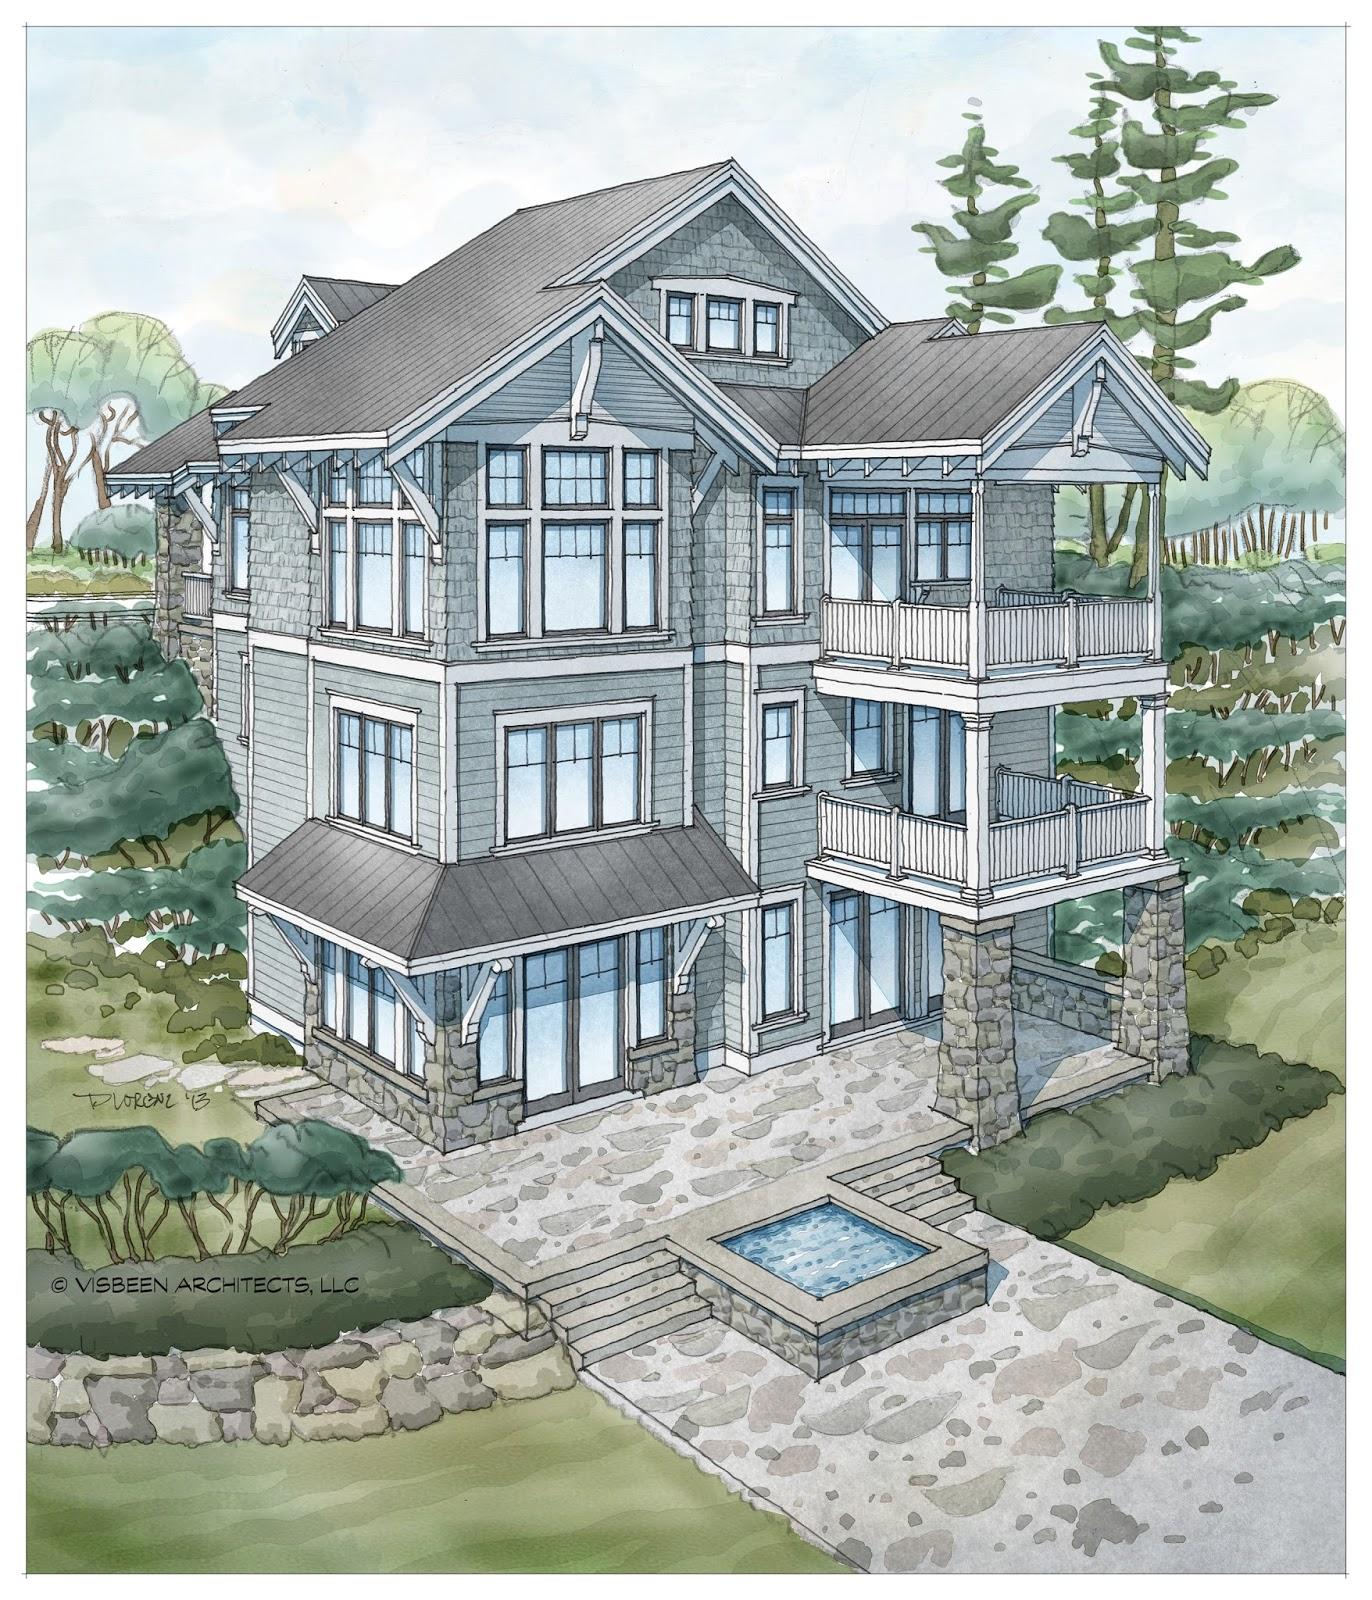 Visbeen Architects